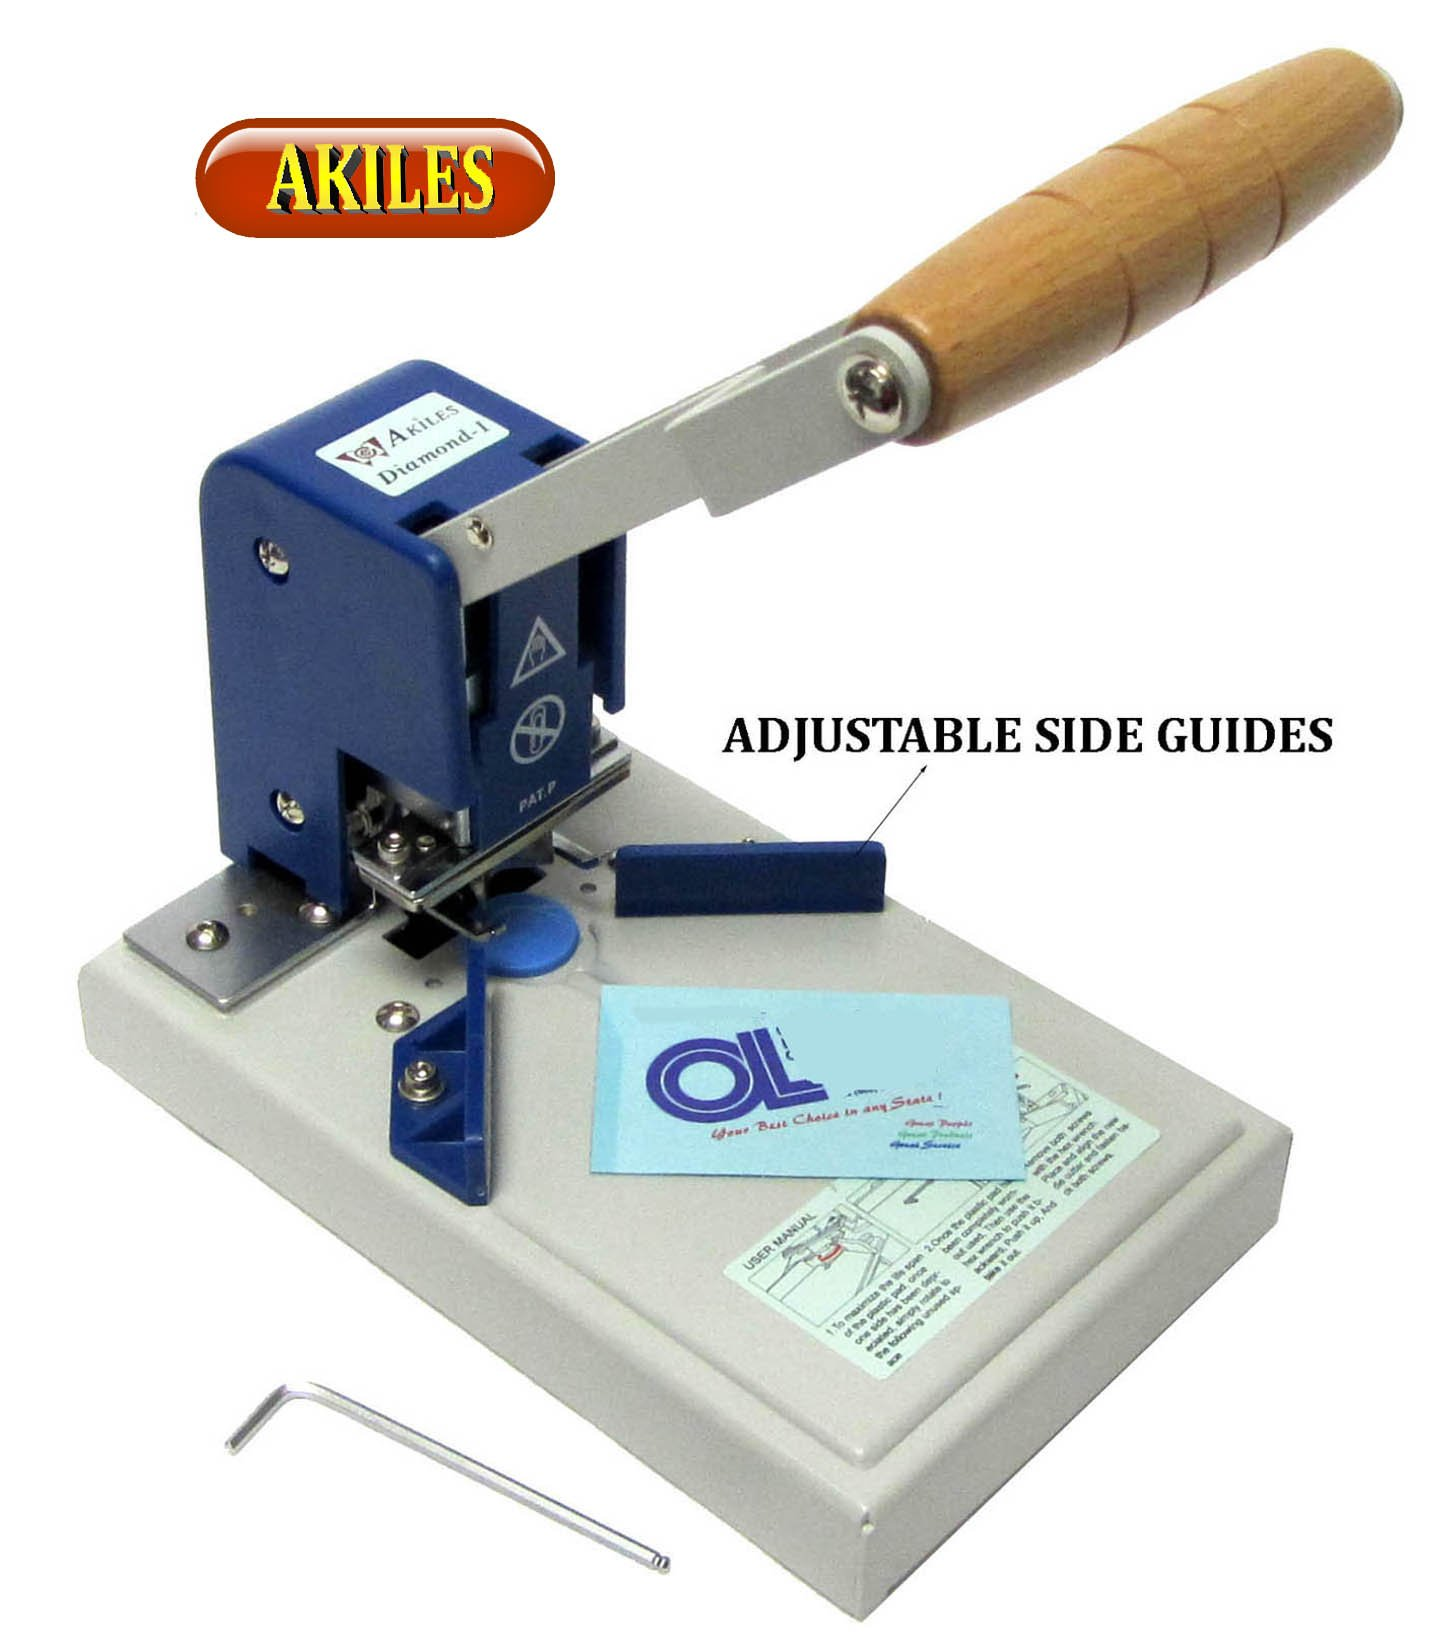 Akiles Diamond-1 Corner Rounder / Corner Cutting Machine w/ 1/4'' Die from ABC Office